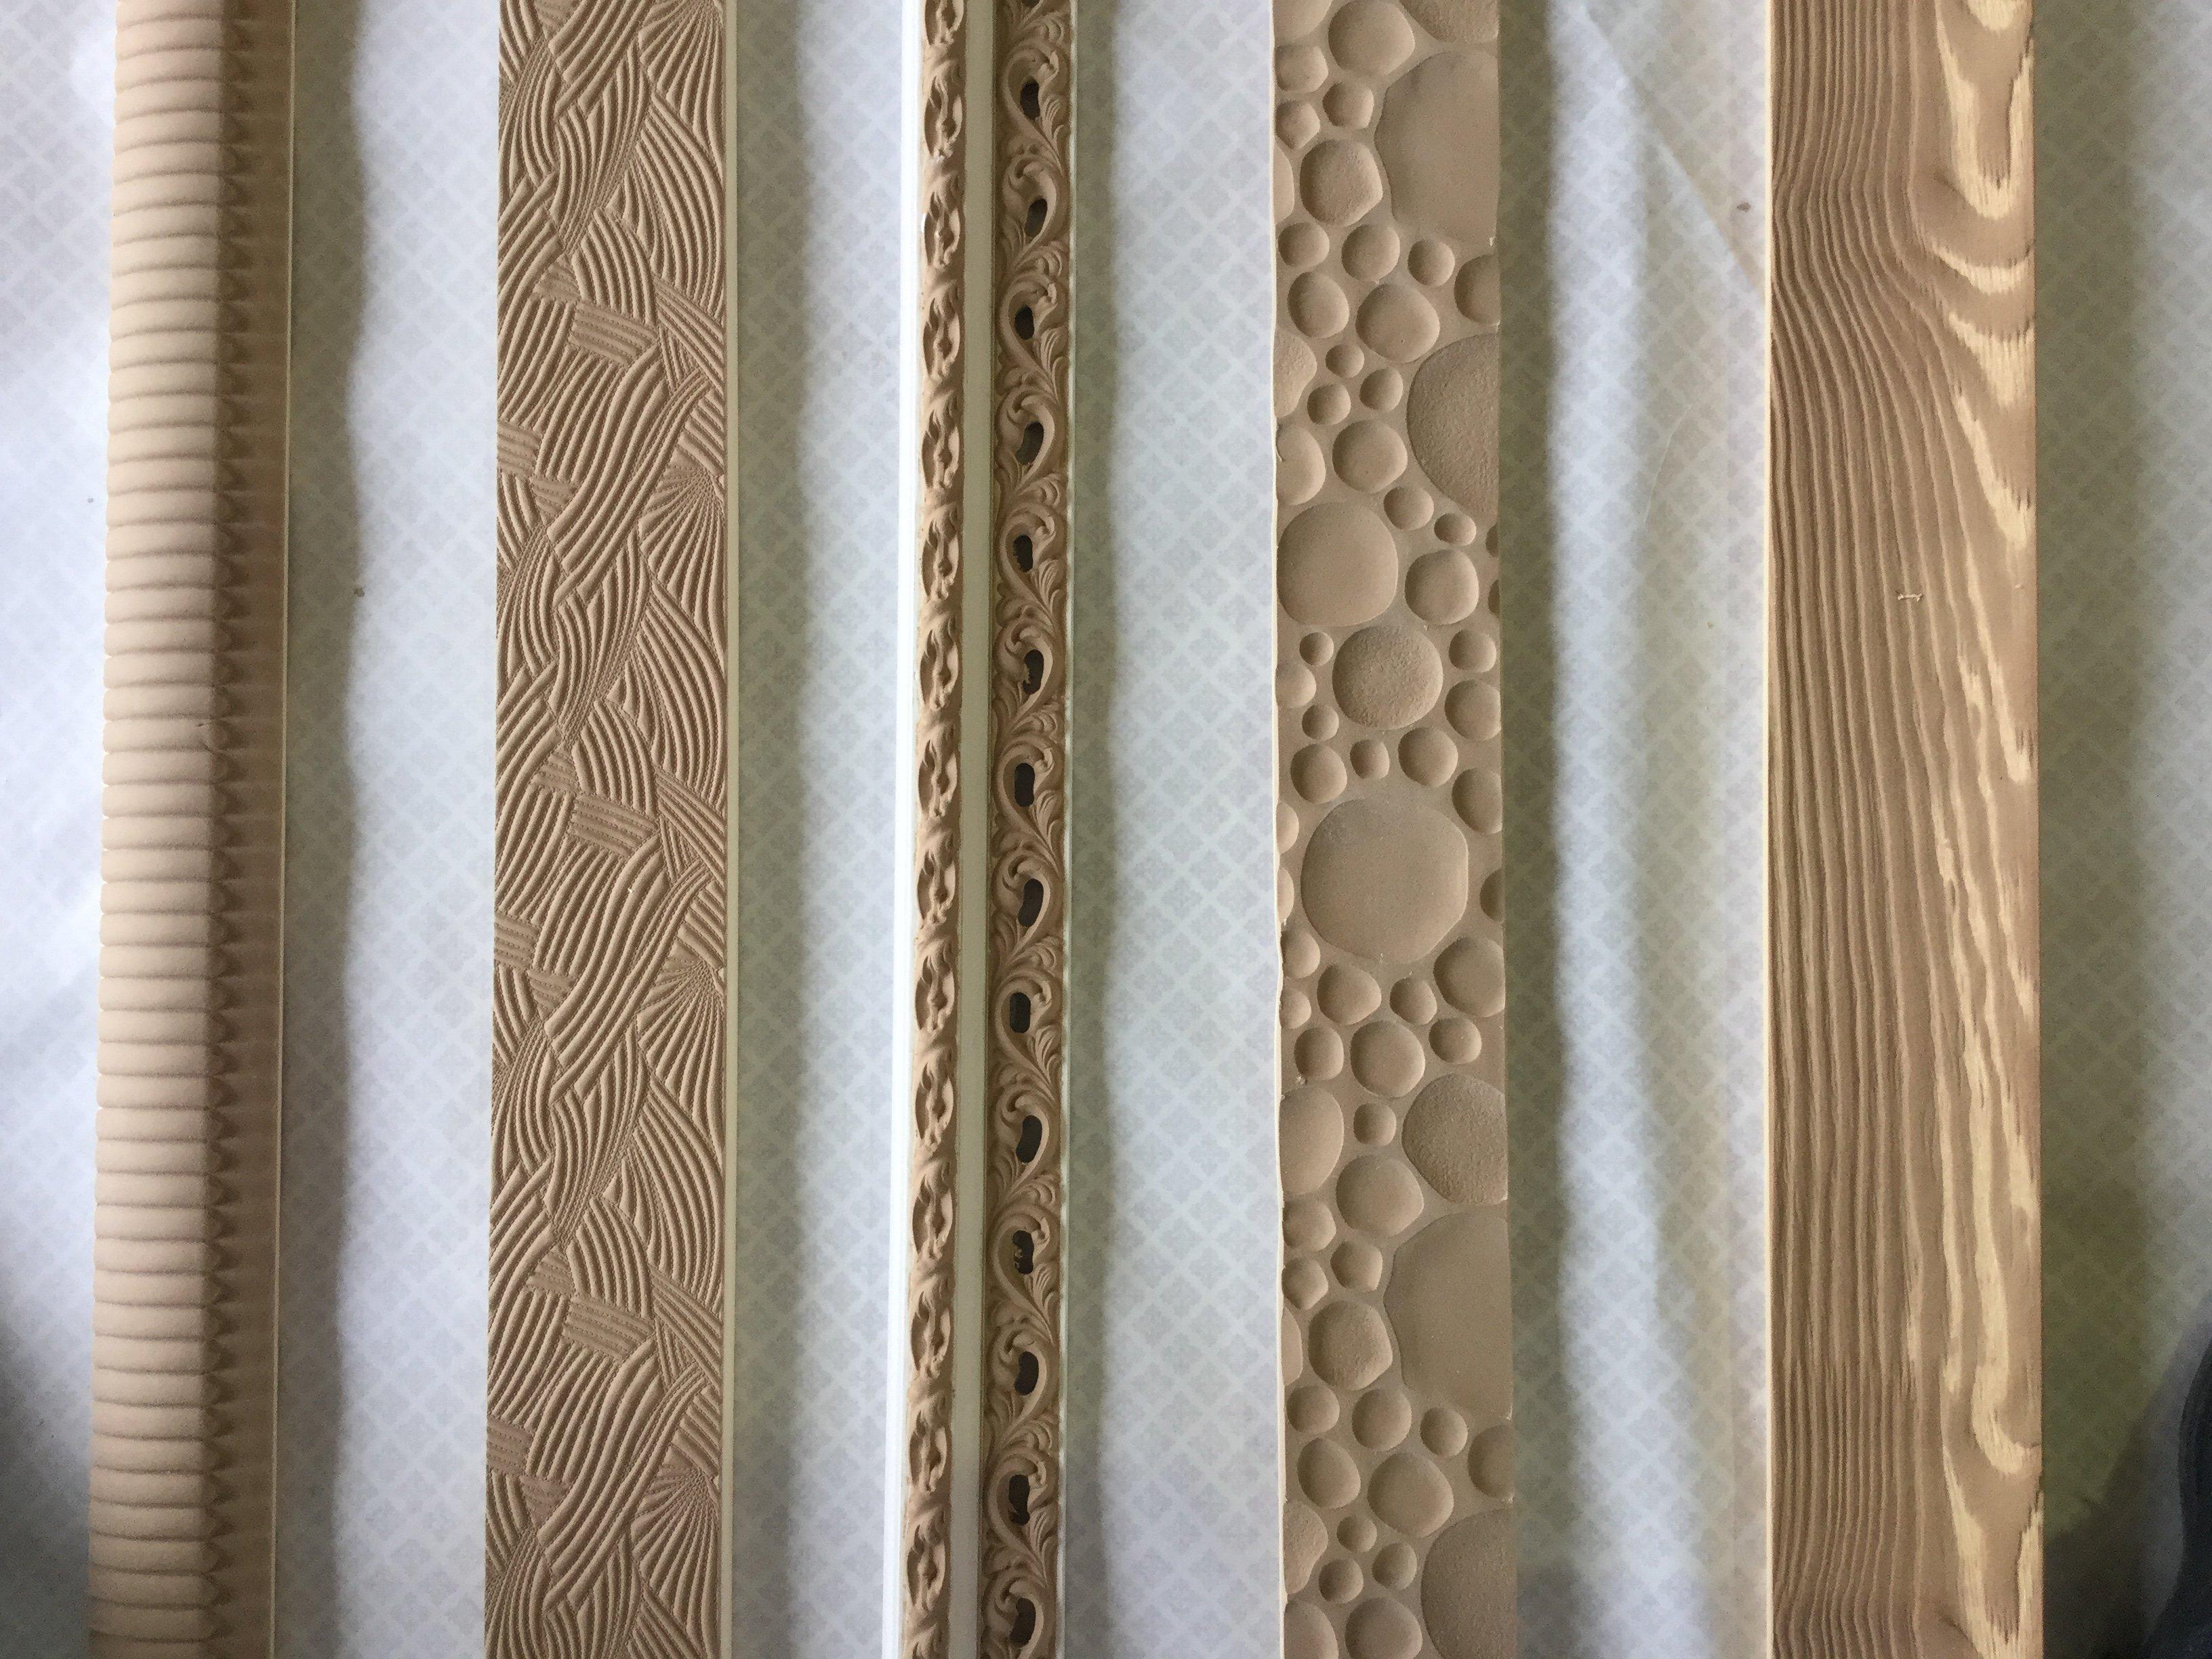 cornici in legno a gruppi da quattro